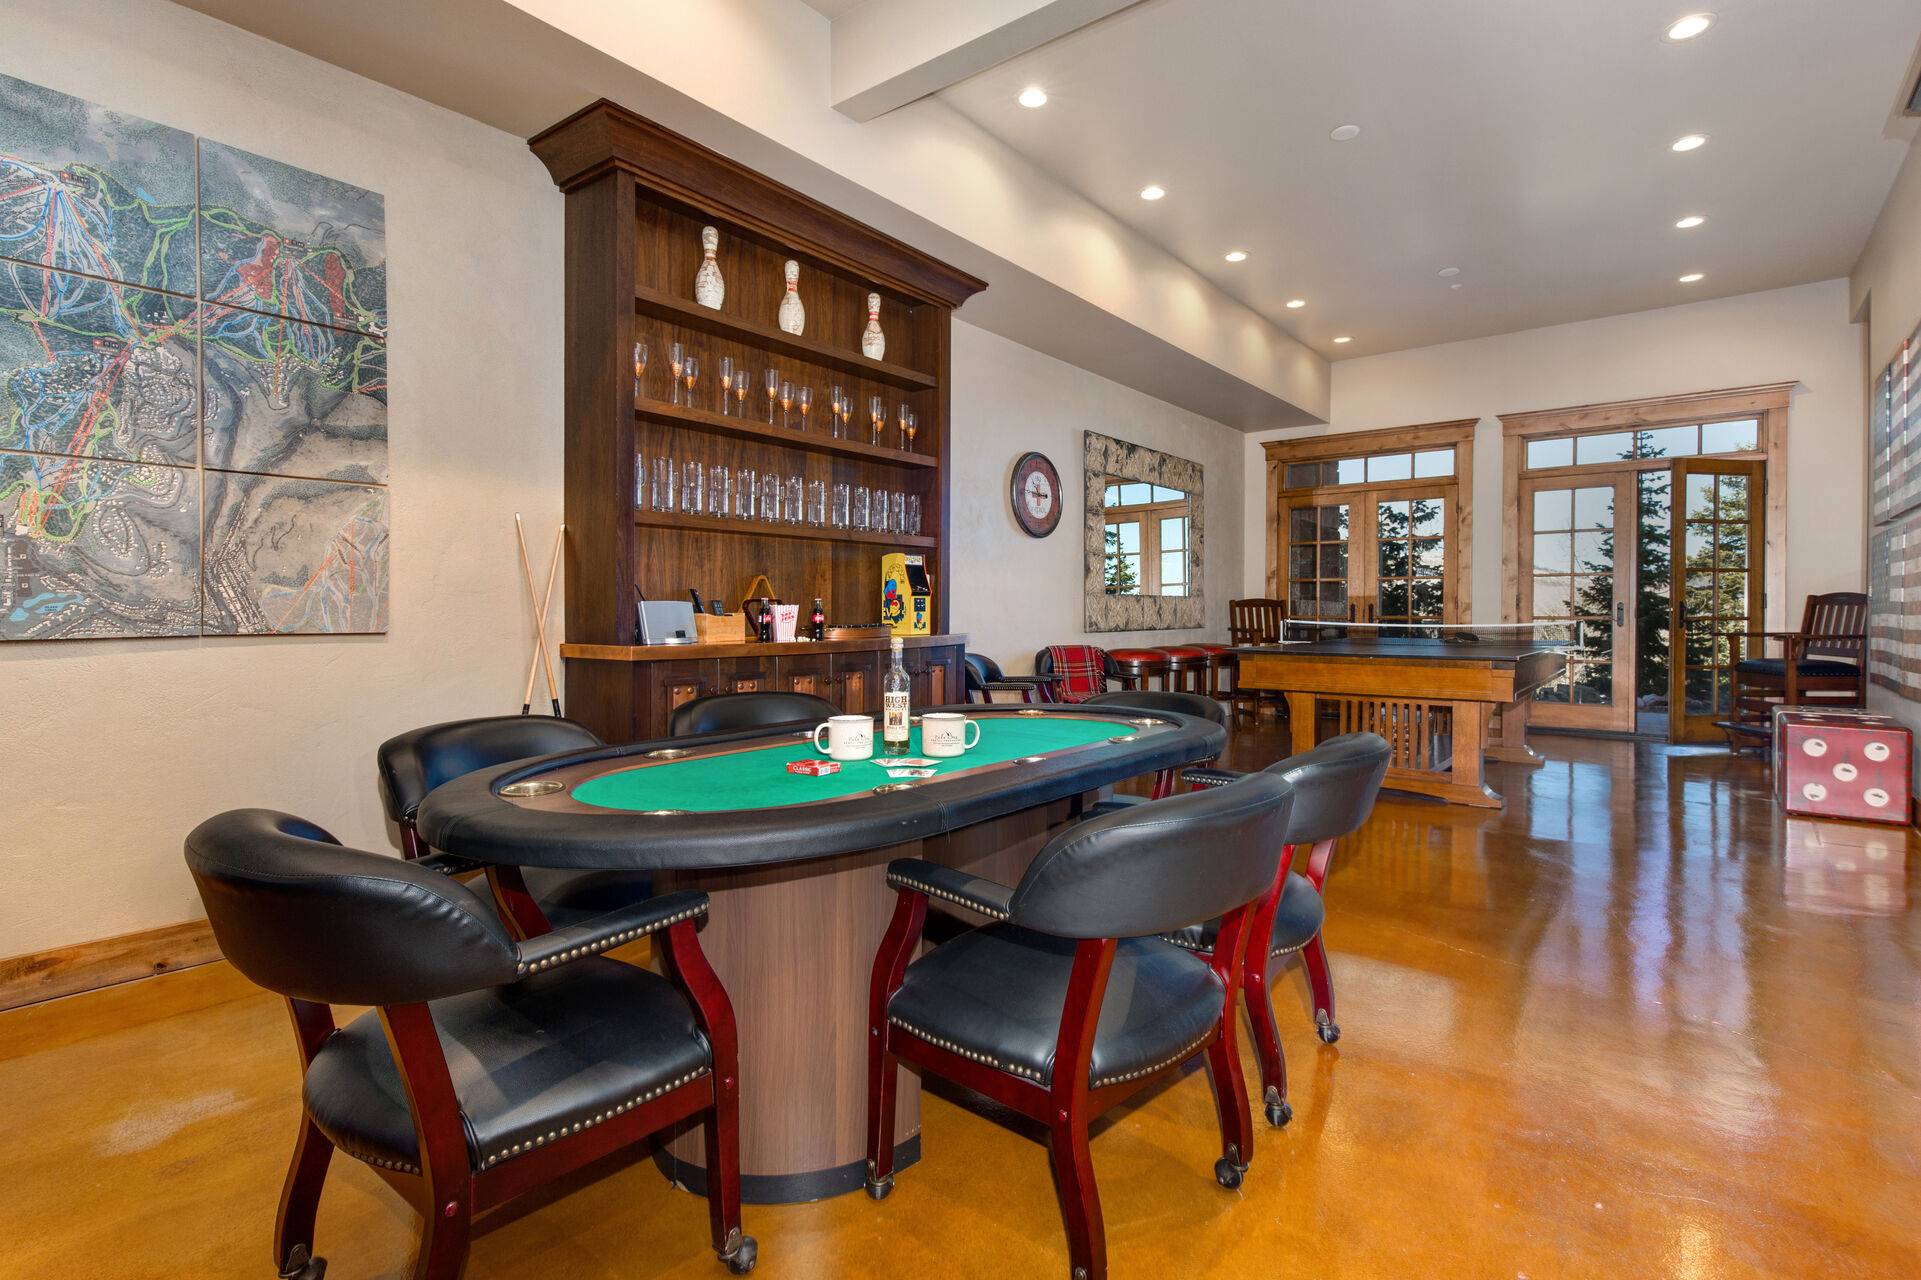 1st Level Game Room - Poker Table